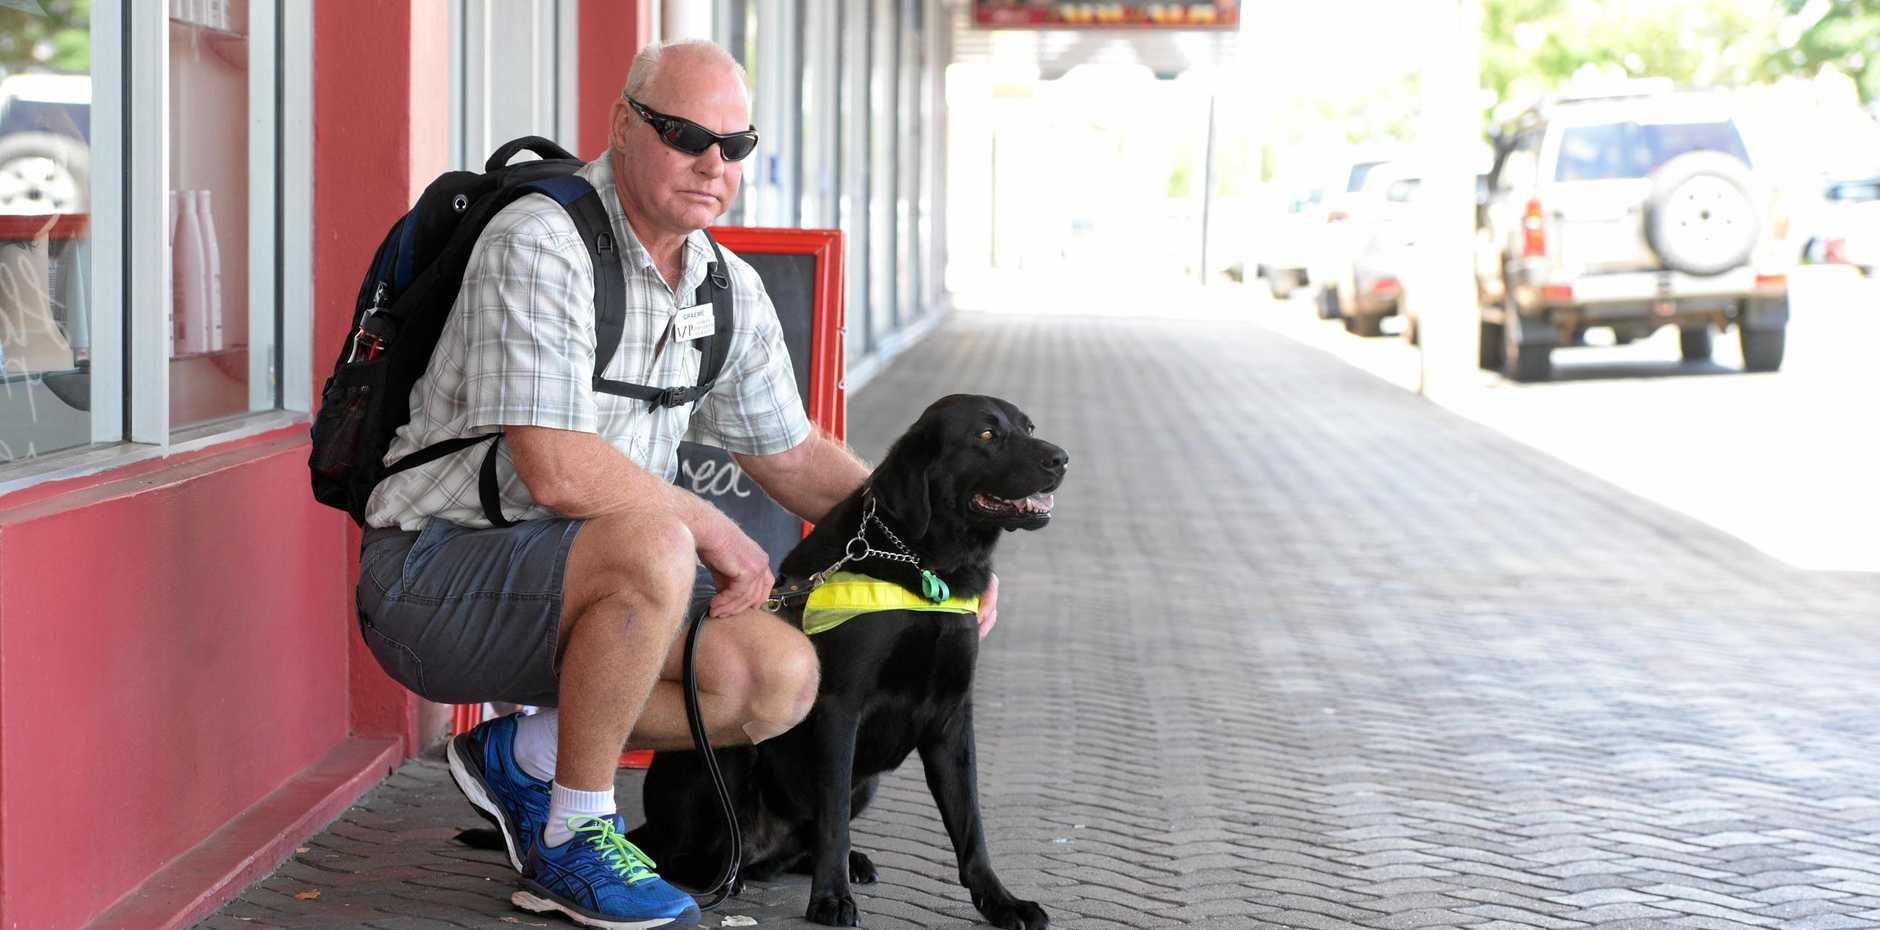 Blind Bundaberg man Graeme Raines was assaulted on Wongarra St.